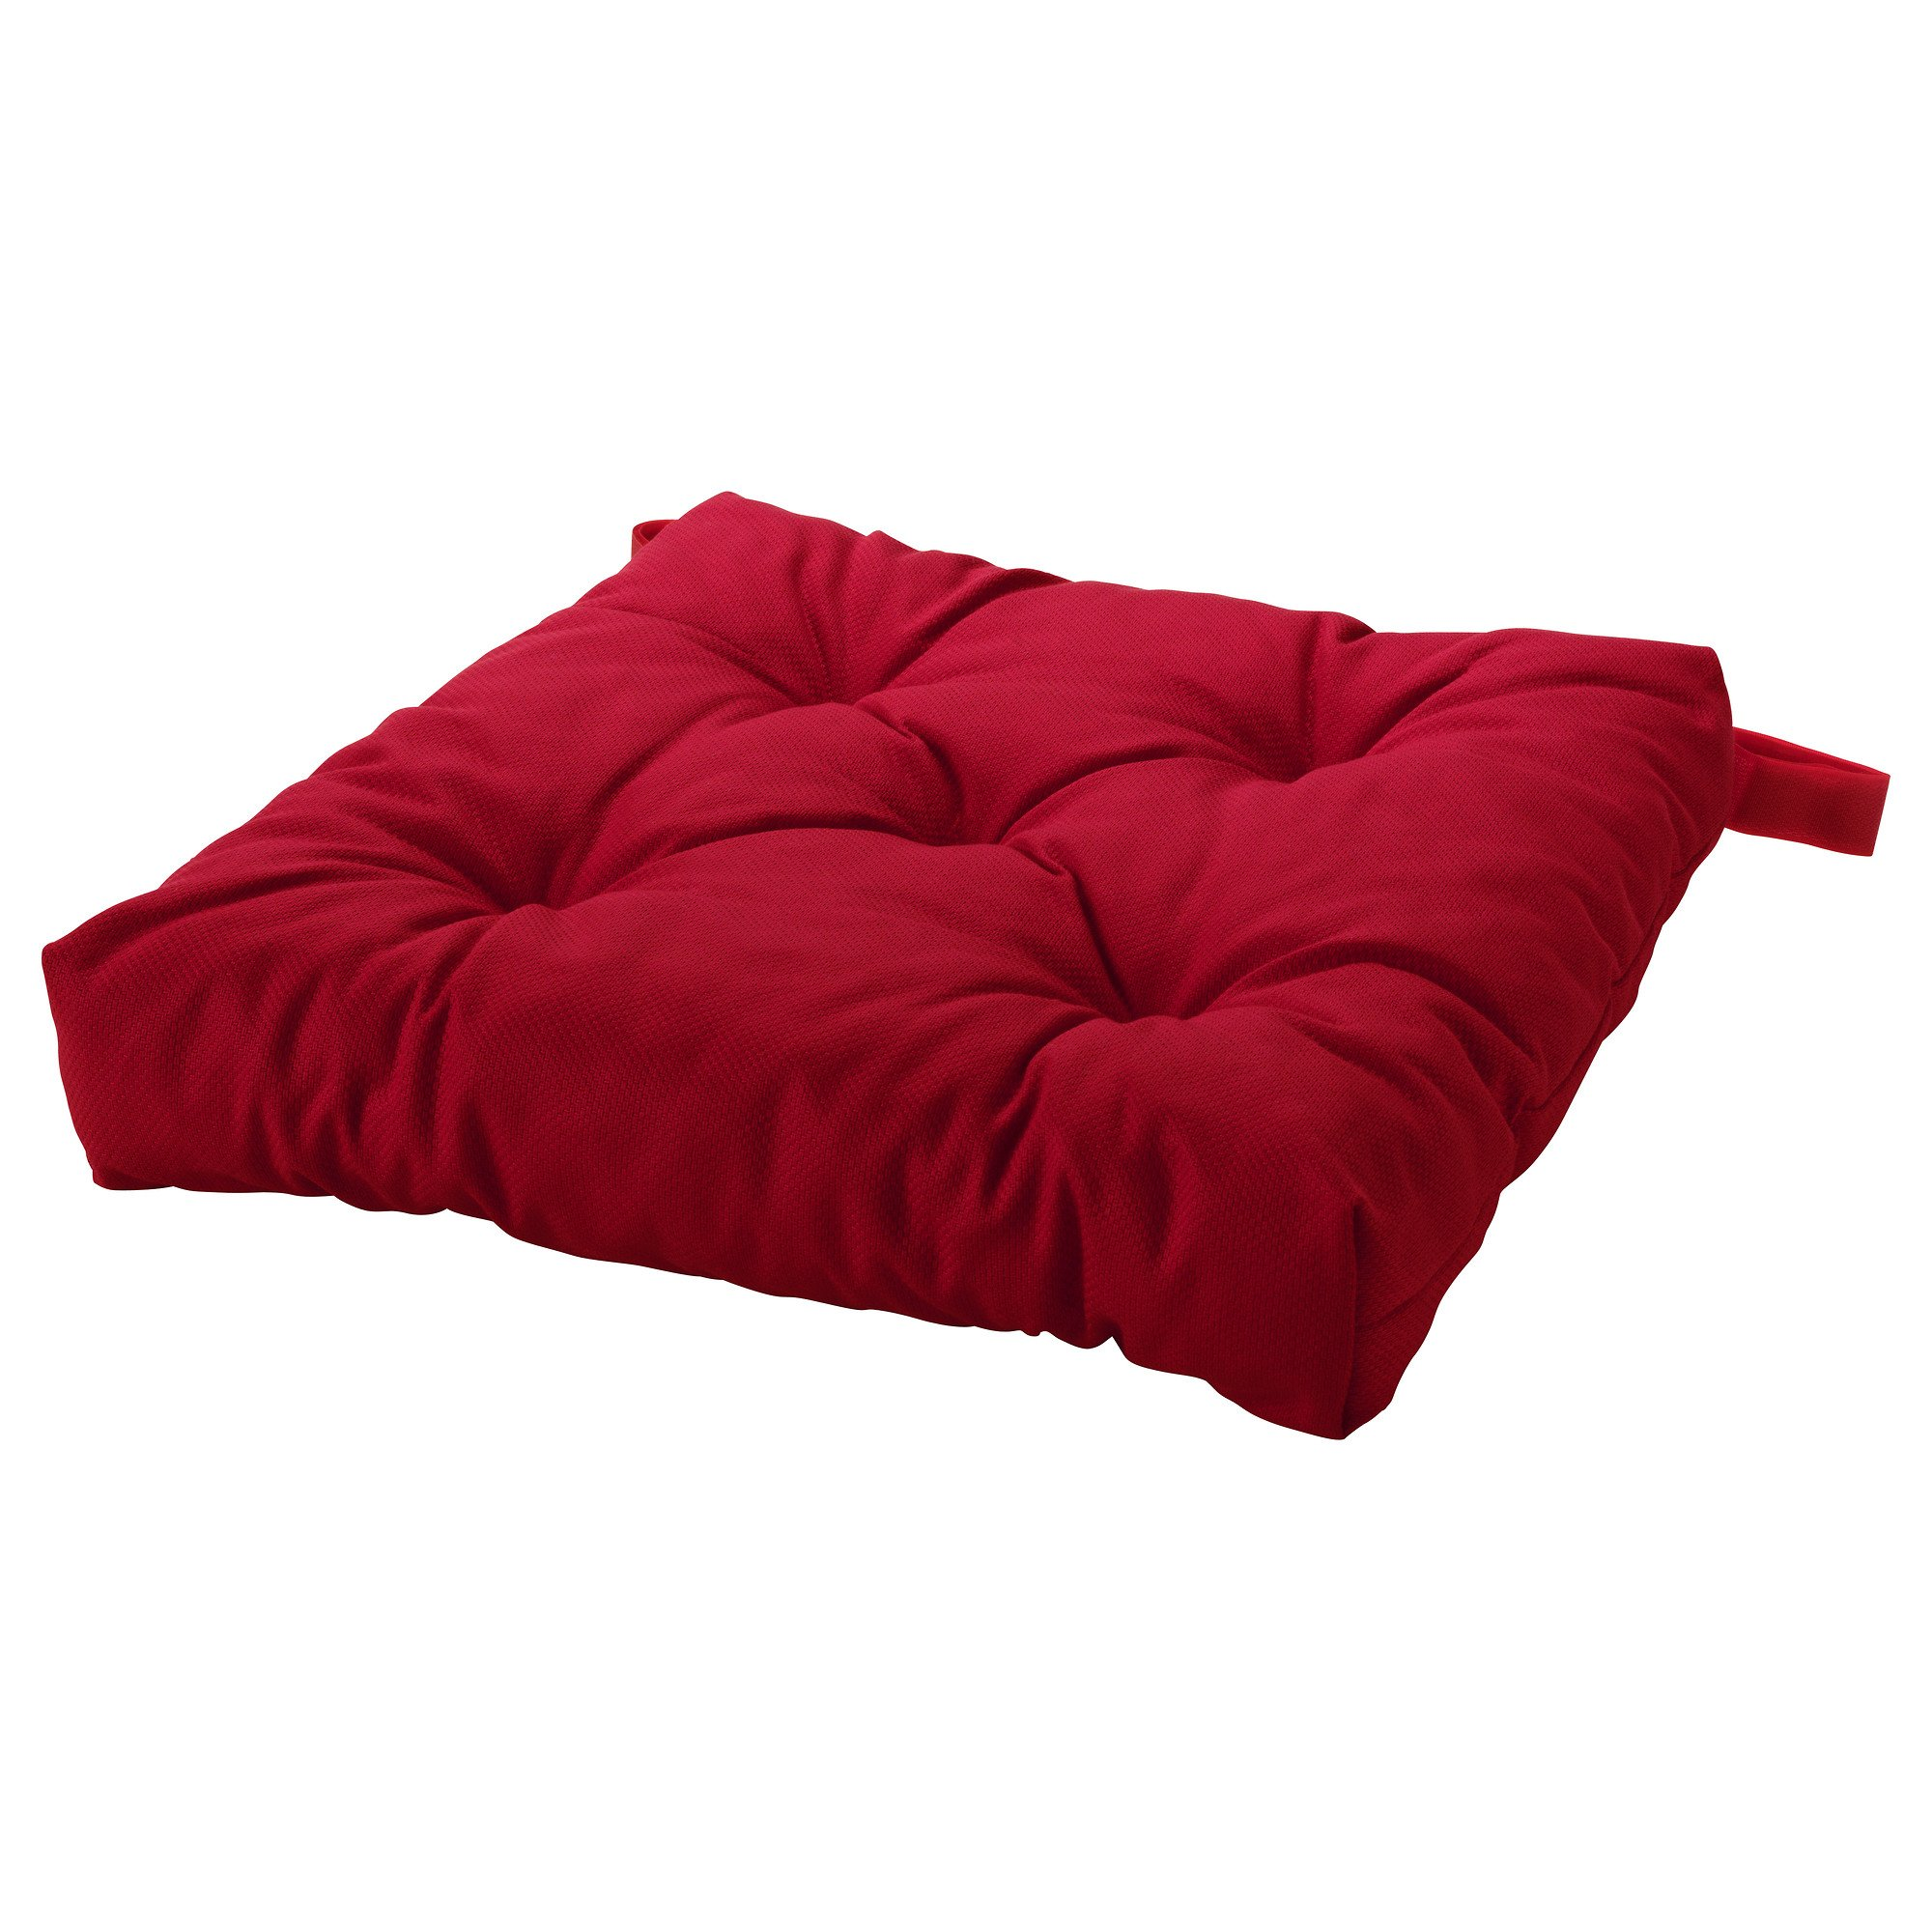 Ikeas MALINDA Chair cushion (1, Red) by Ikea (Image #2)